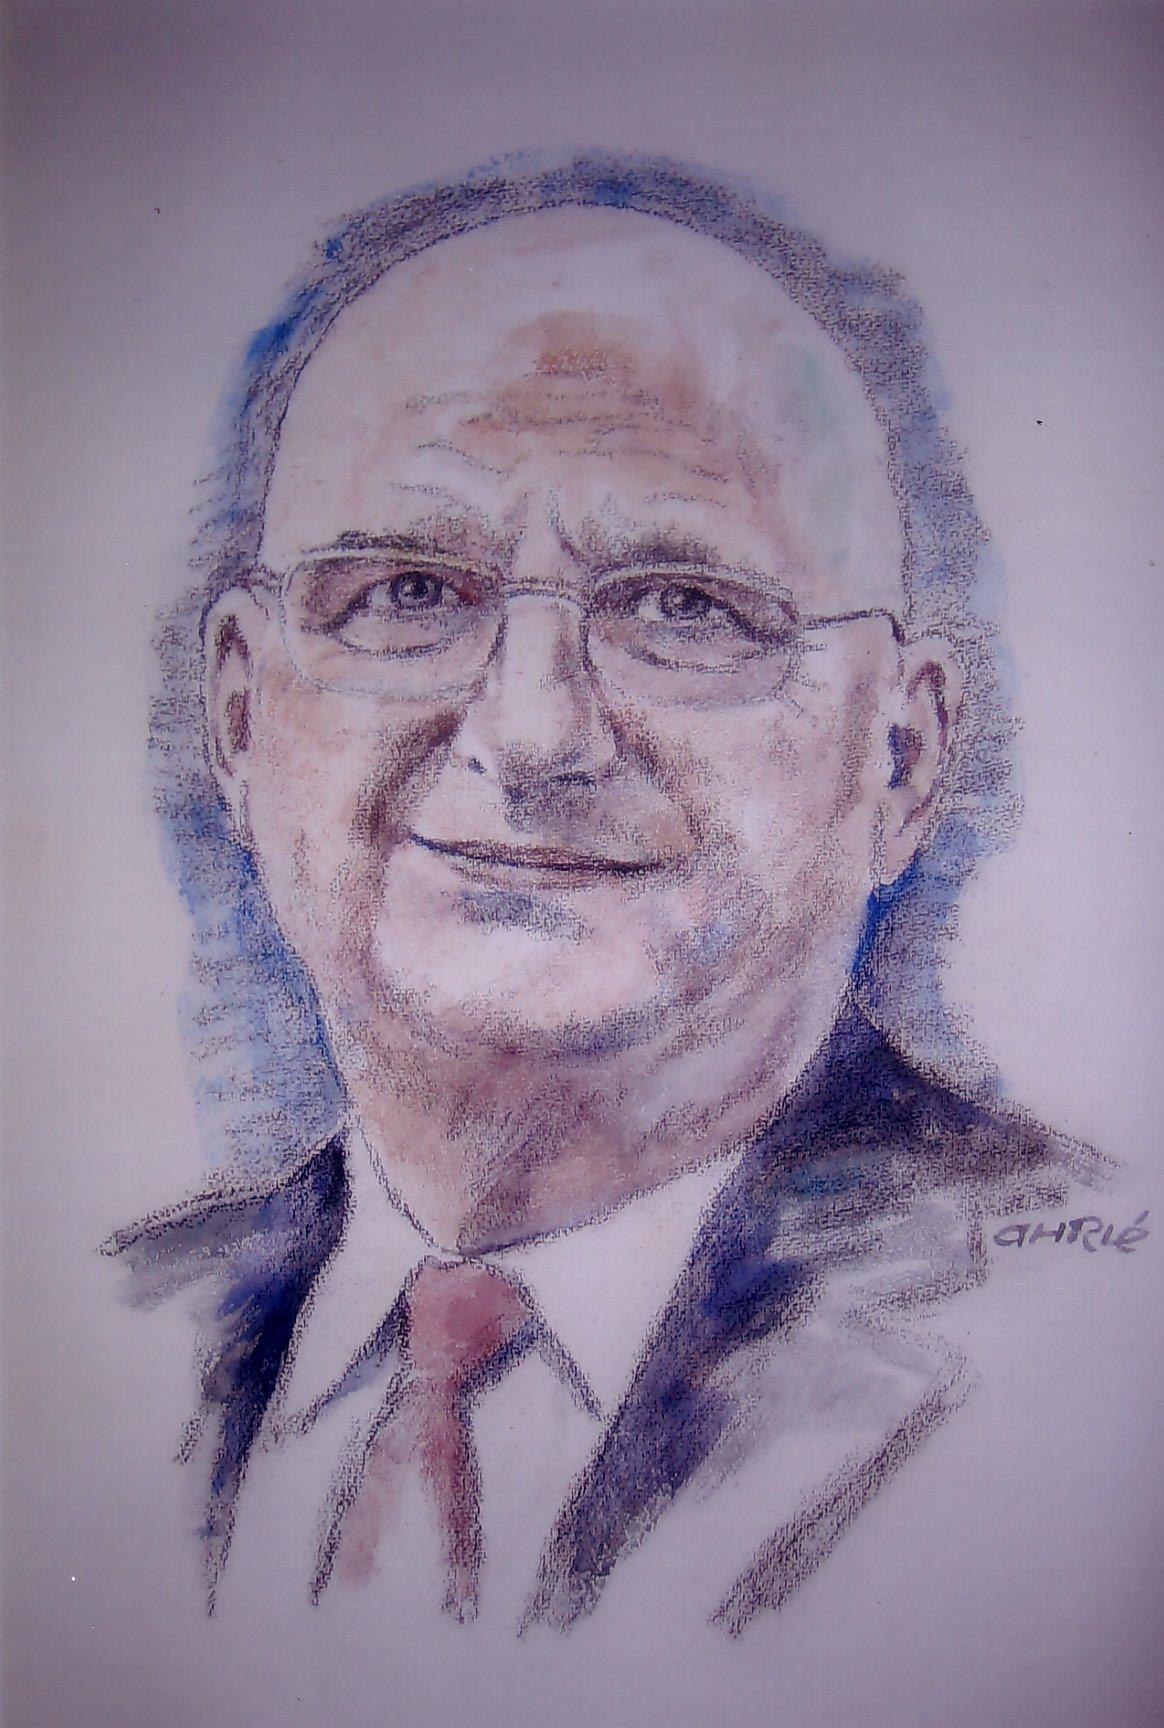 Ferry Ahrlé porträtiert Walter Huber, den Vorstands-Chef der Bethmann Bank